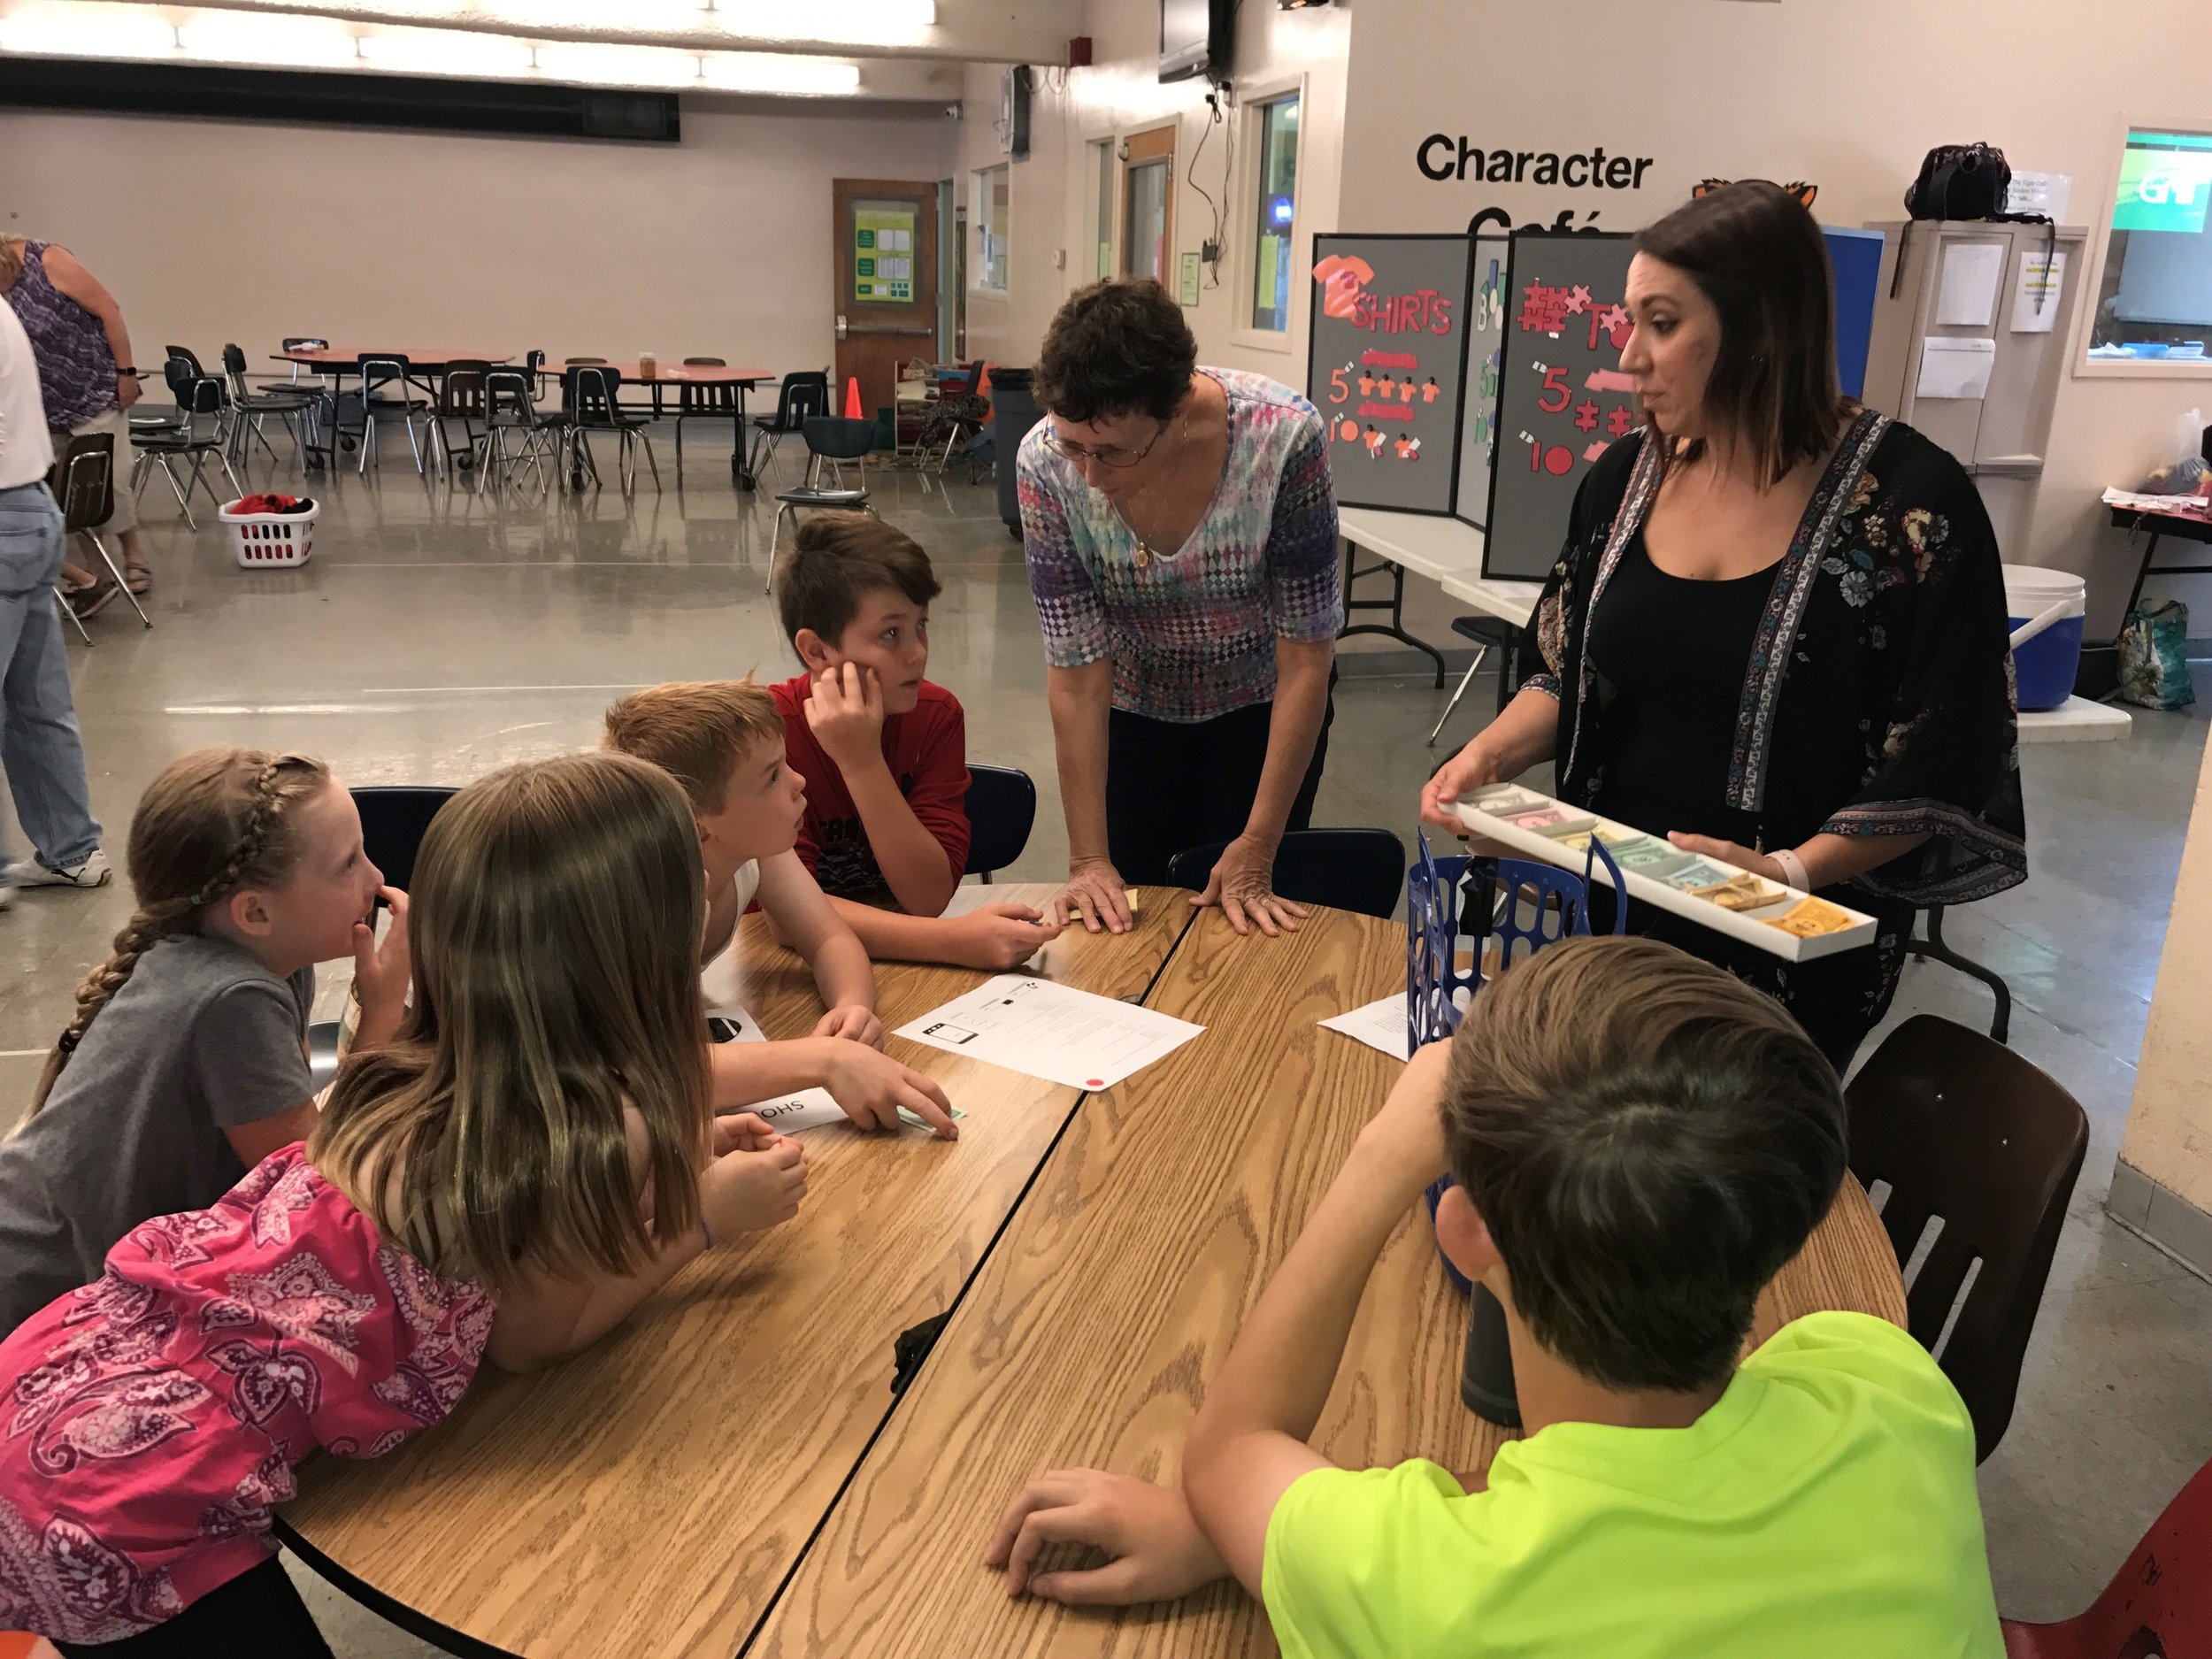 YMCA Childrens Programming June 2017 Action 6  Photo.jpg